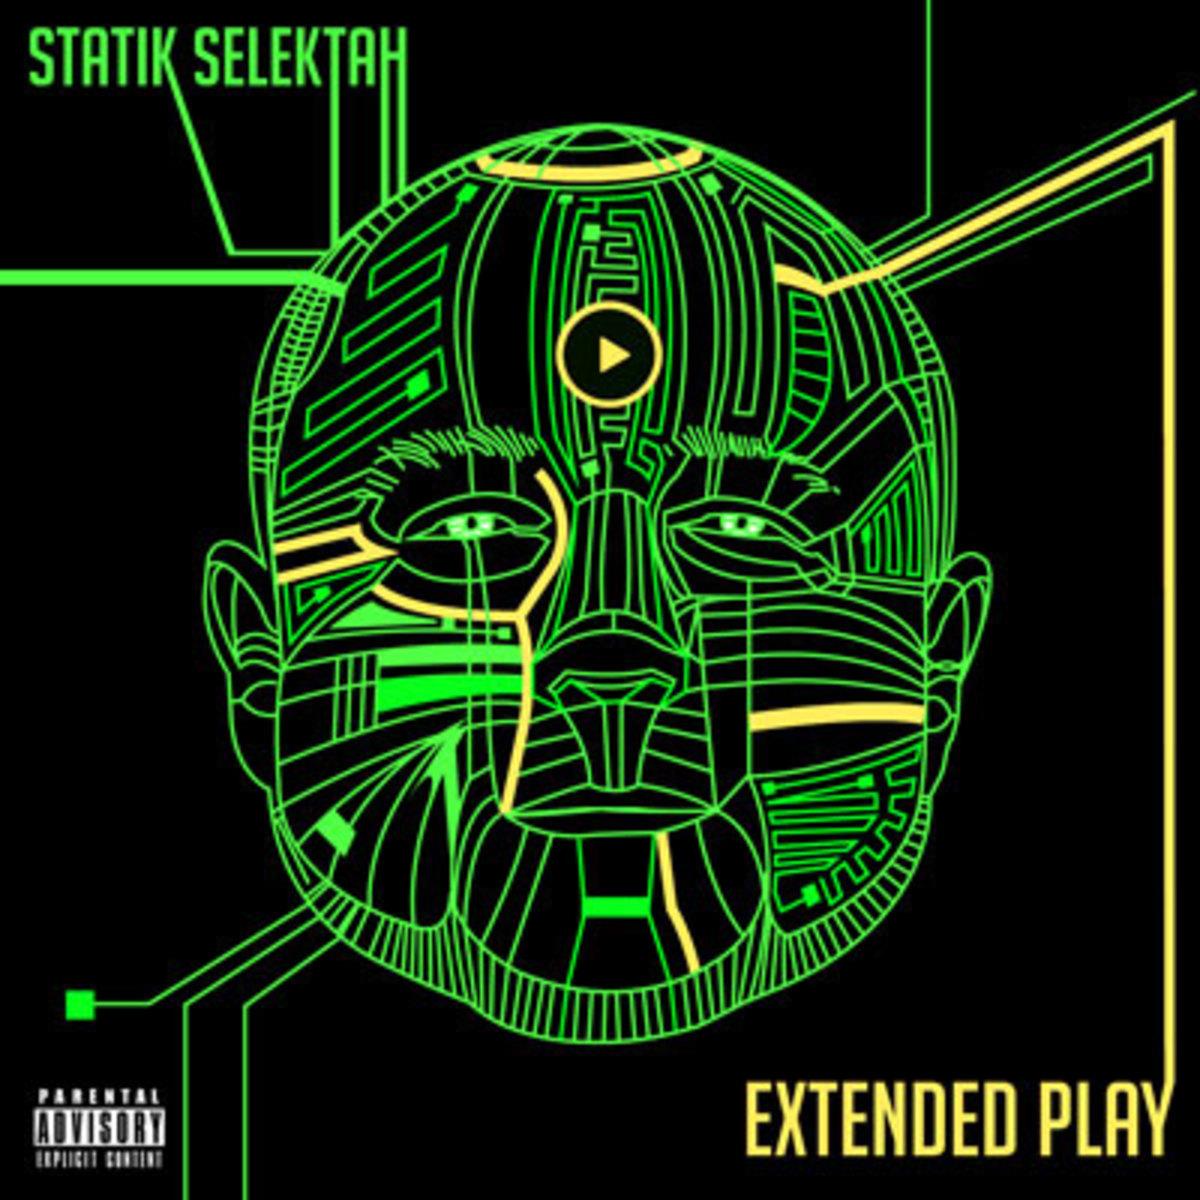 statik-extendedplay.jpg